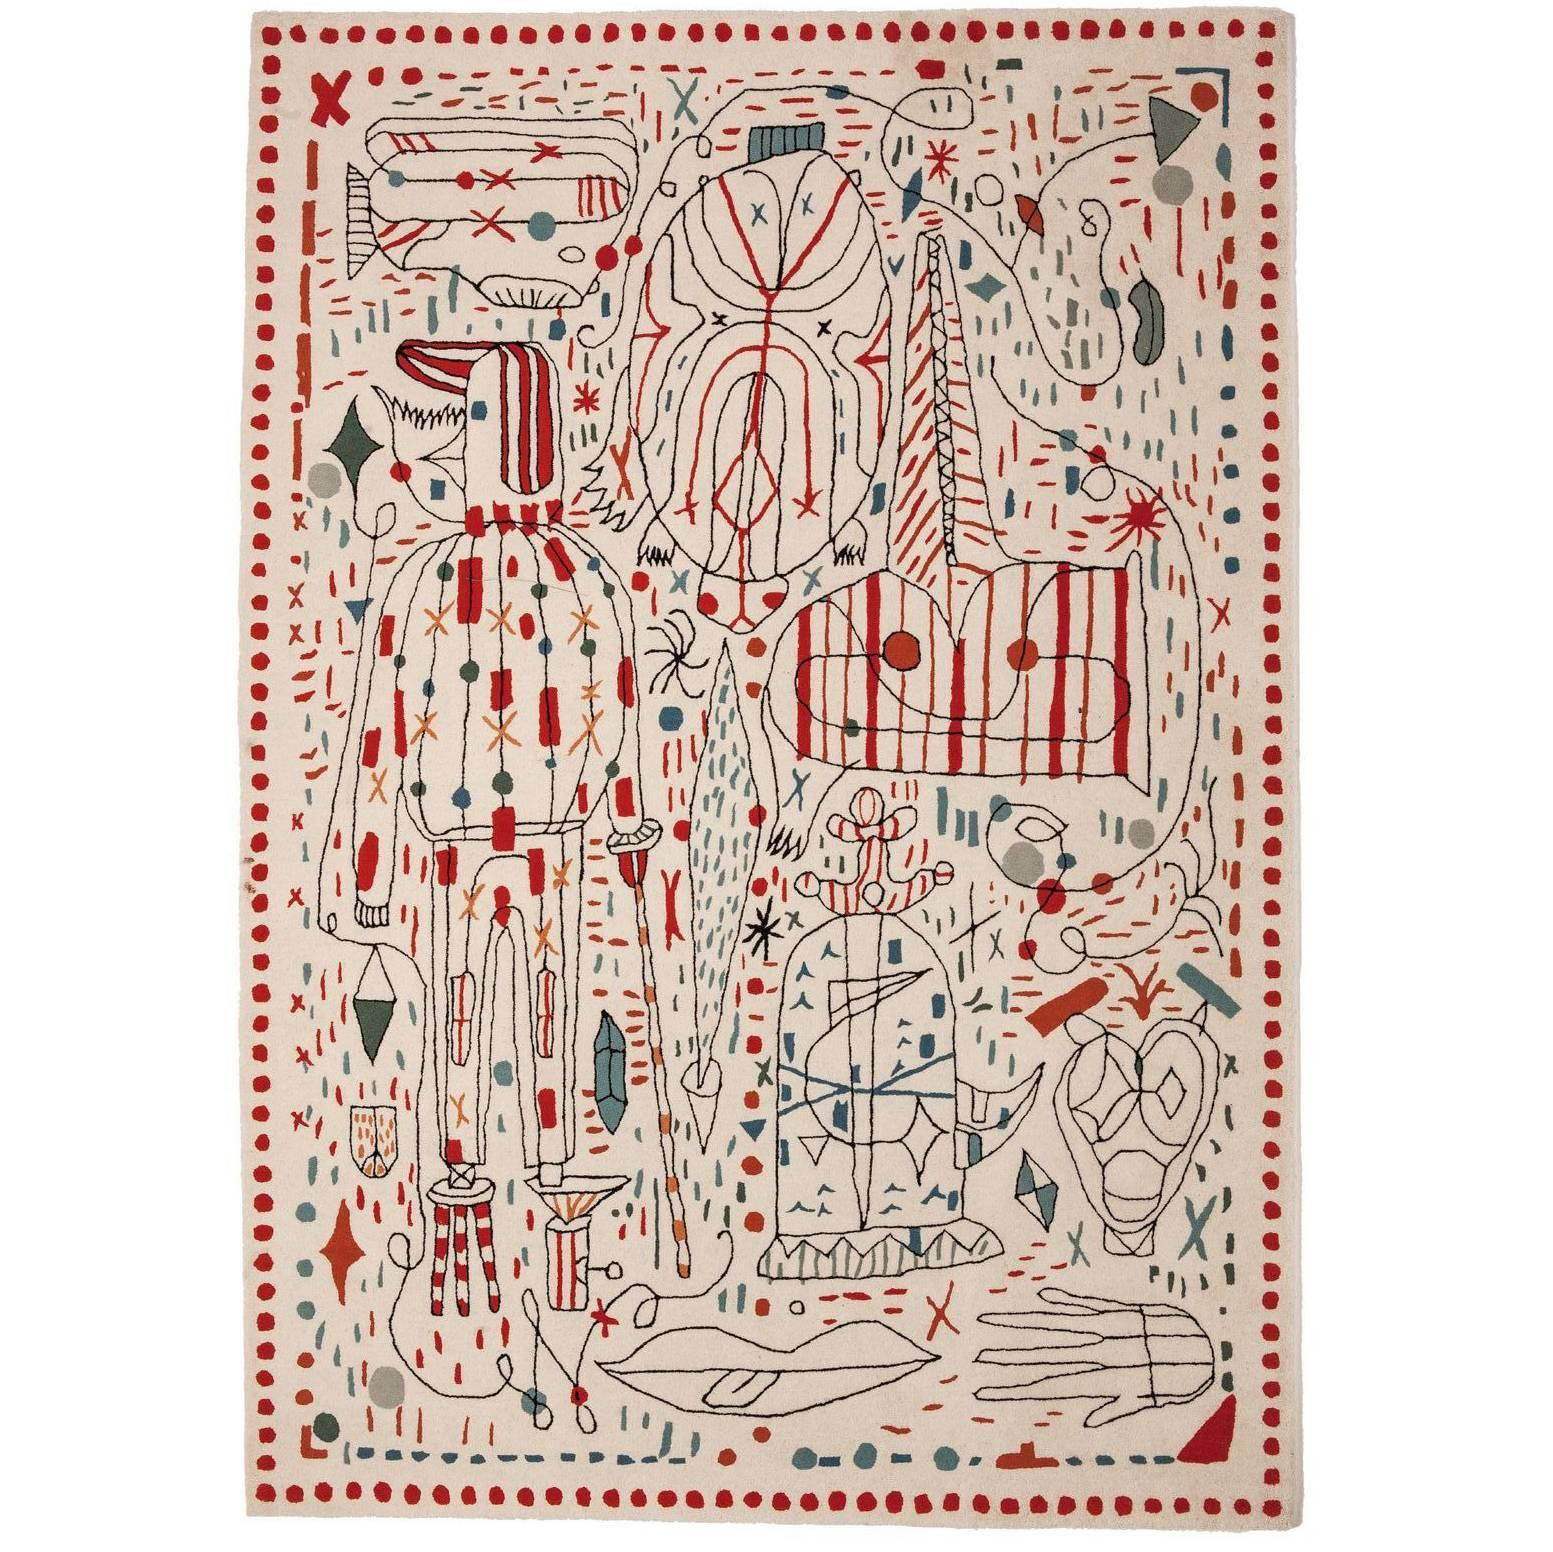 Contemporary Hayon x Nani Hand-Tufted Wool Area Rug by Jaime Hayon Medium